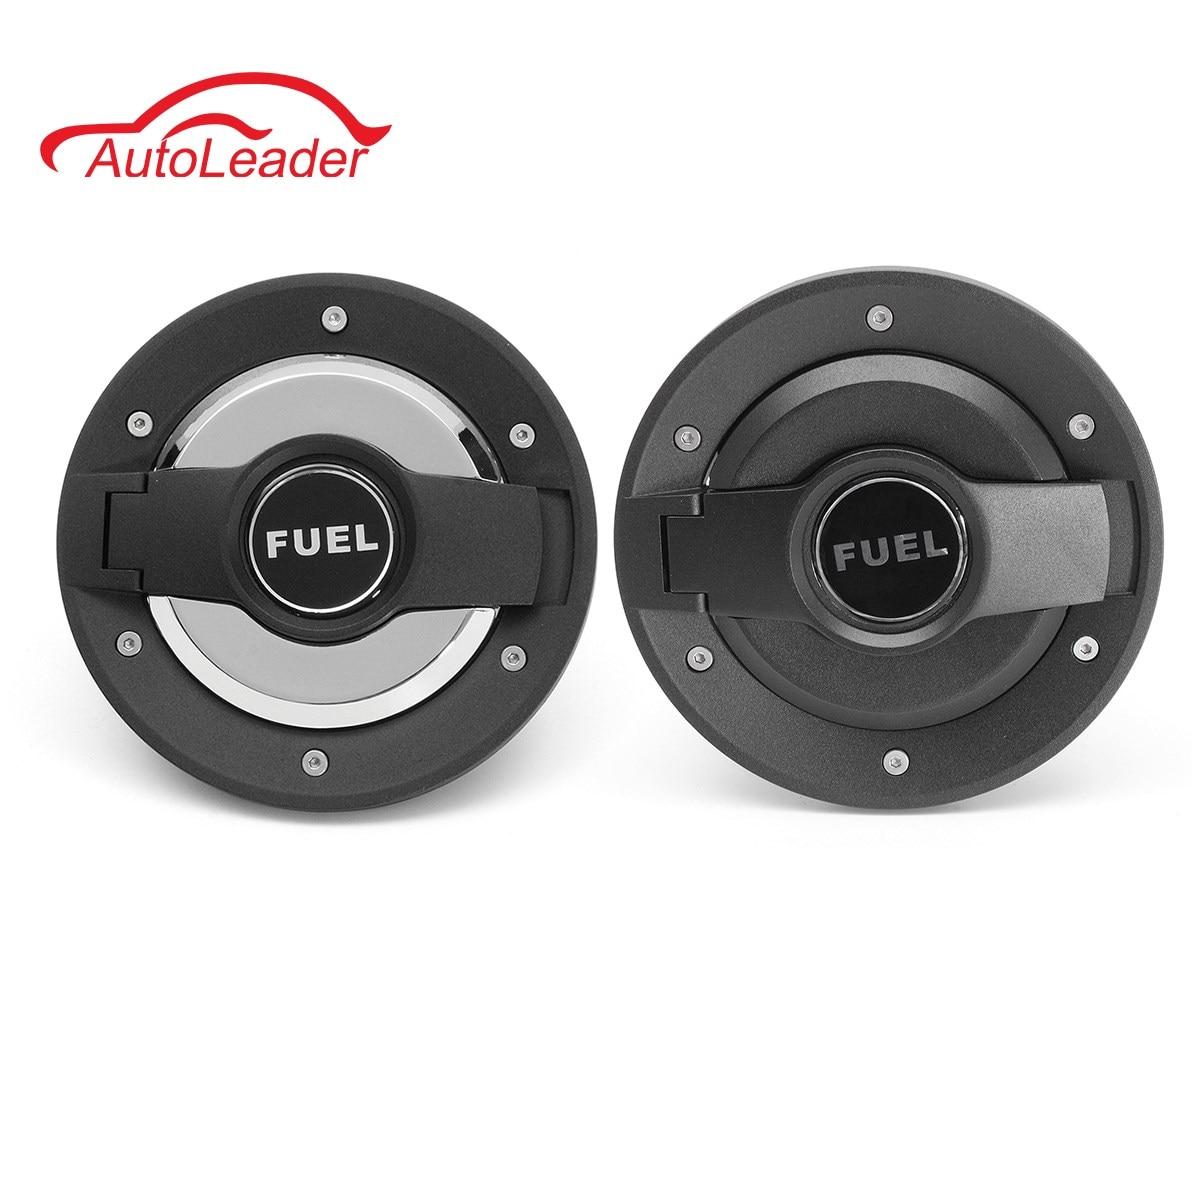 Car fuel filler door cover gas tank cap for jeep wrangler jk unlimited